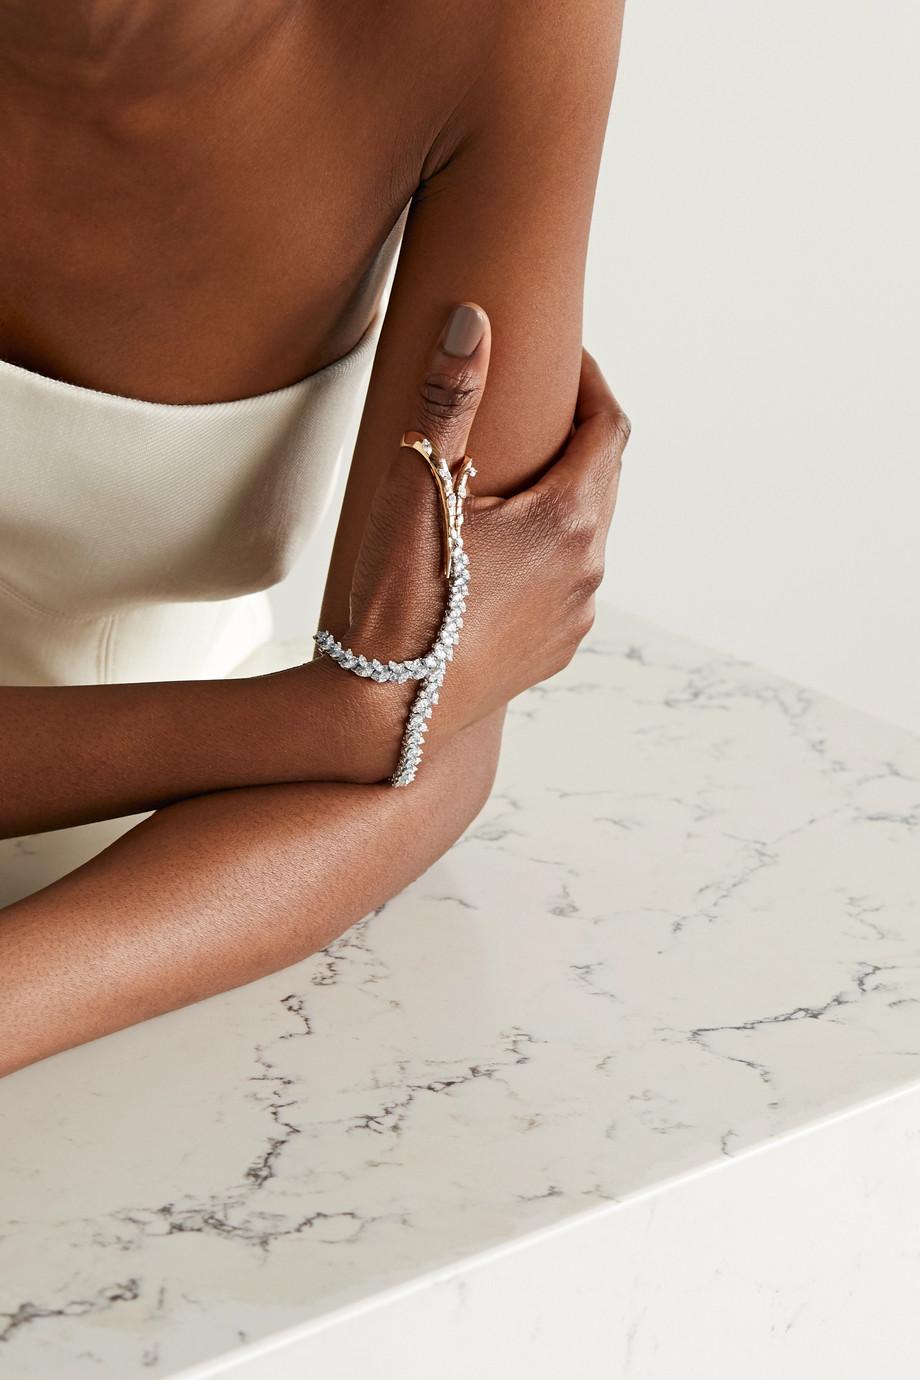 YEPREM 18-karat white and yellow gold diamond bracelet